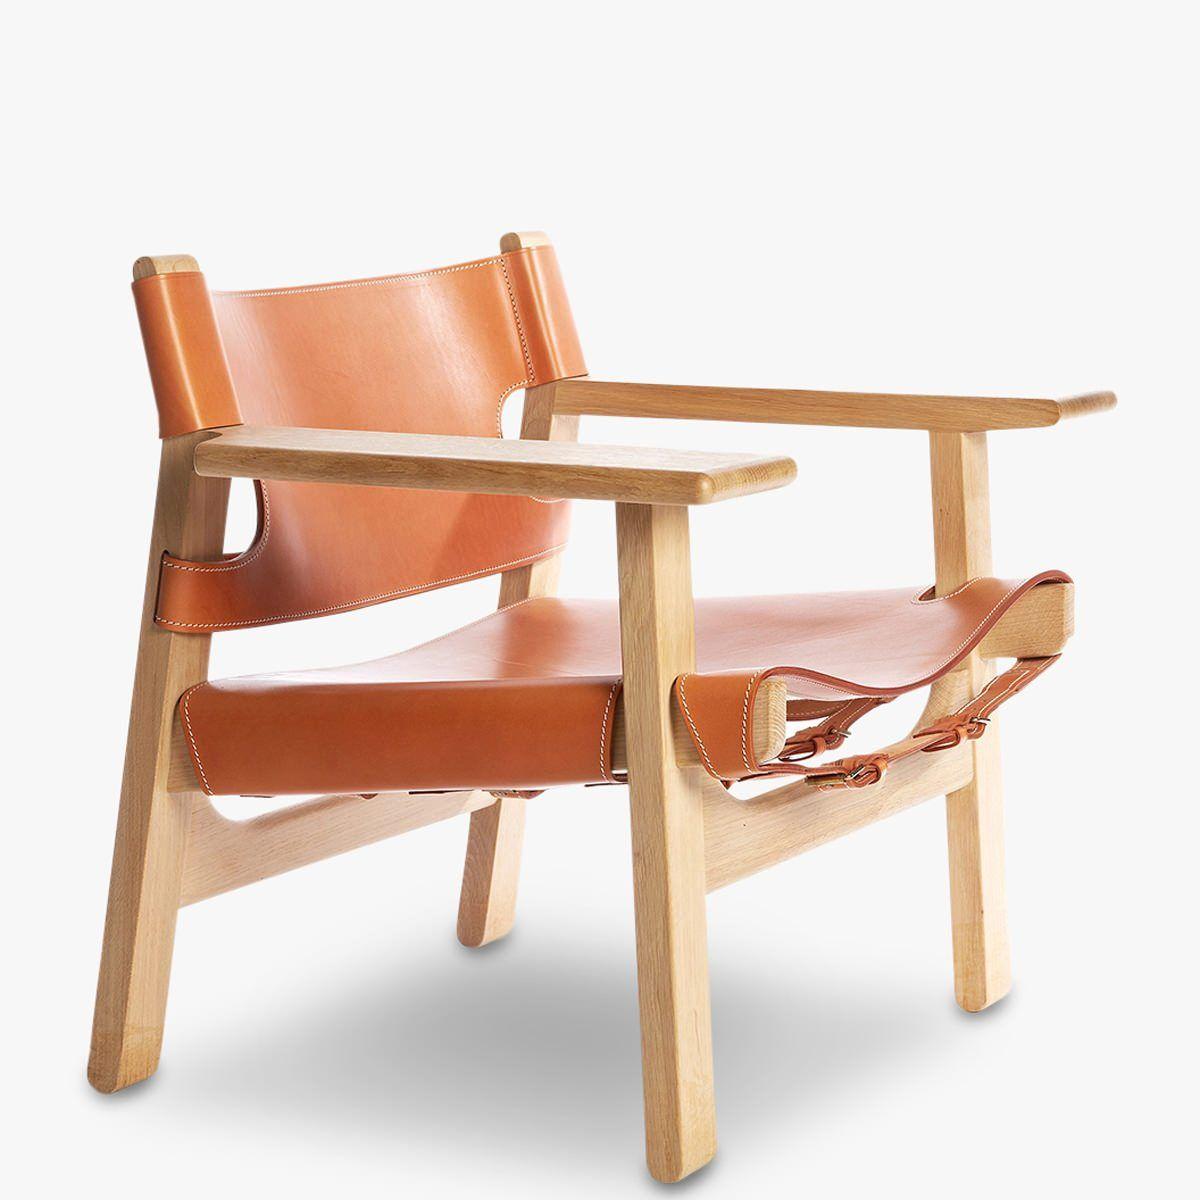 spanish chair oak natural front side1 1200 furniture pinterest